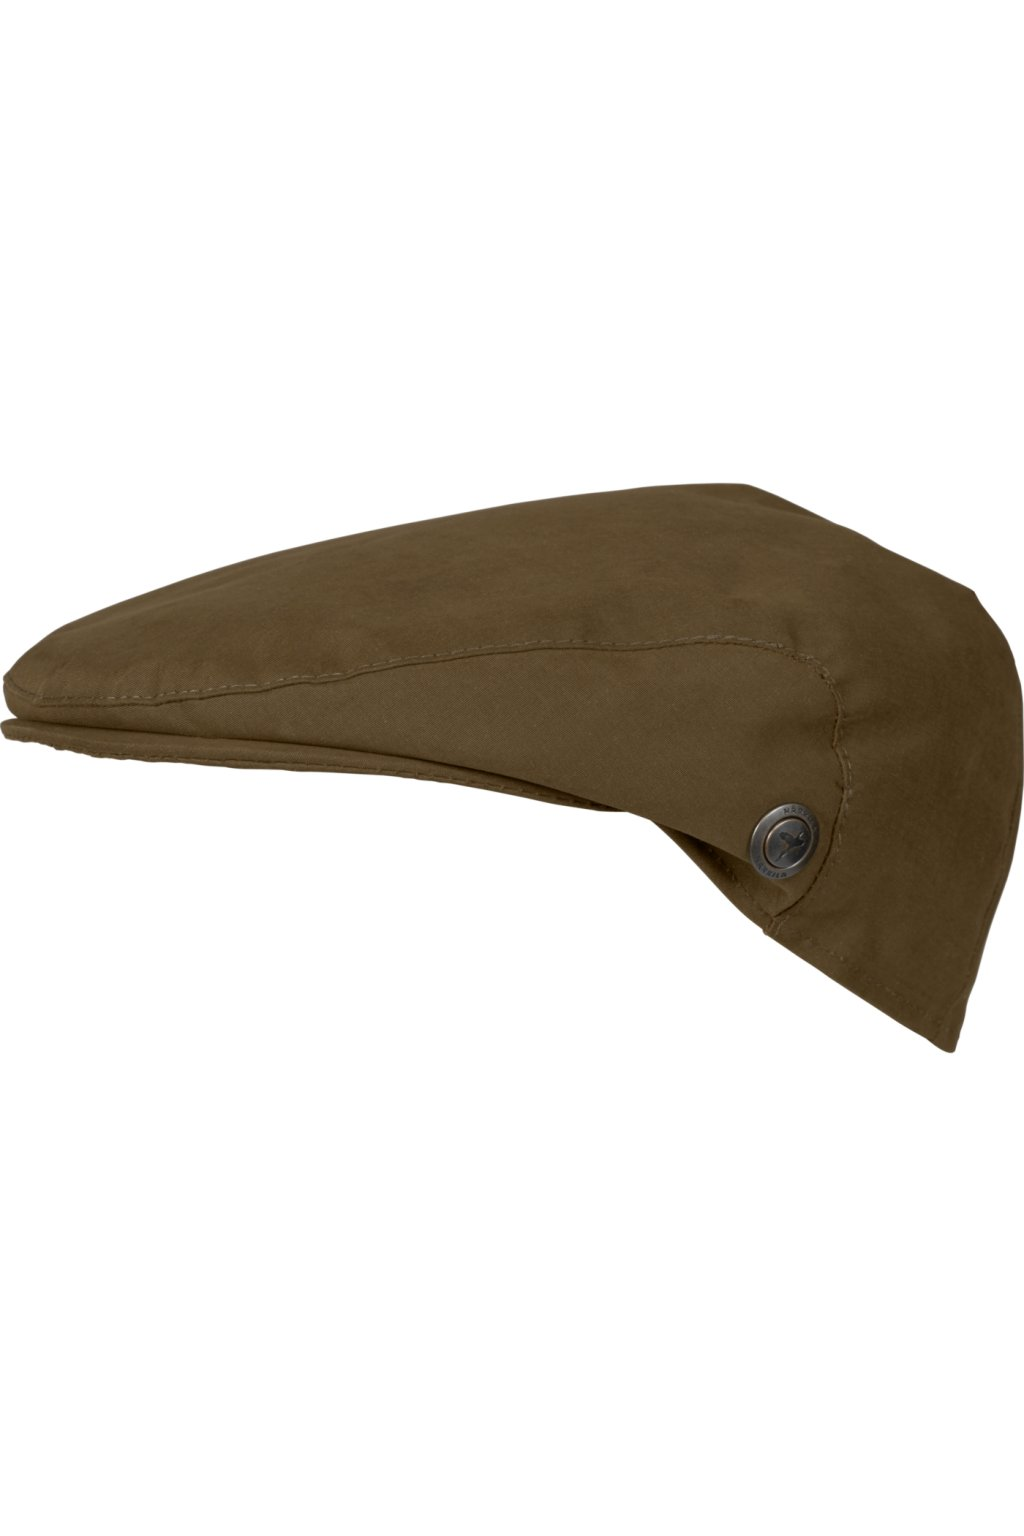 HÄRKILA - Retrieve flat cap